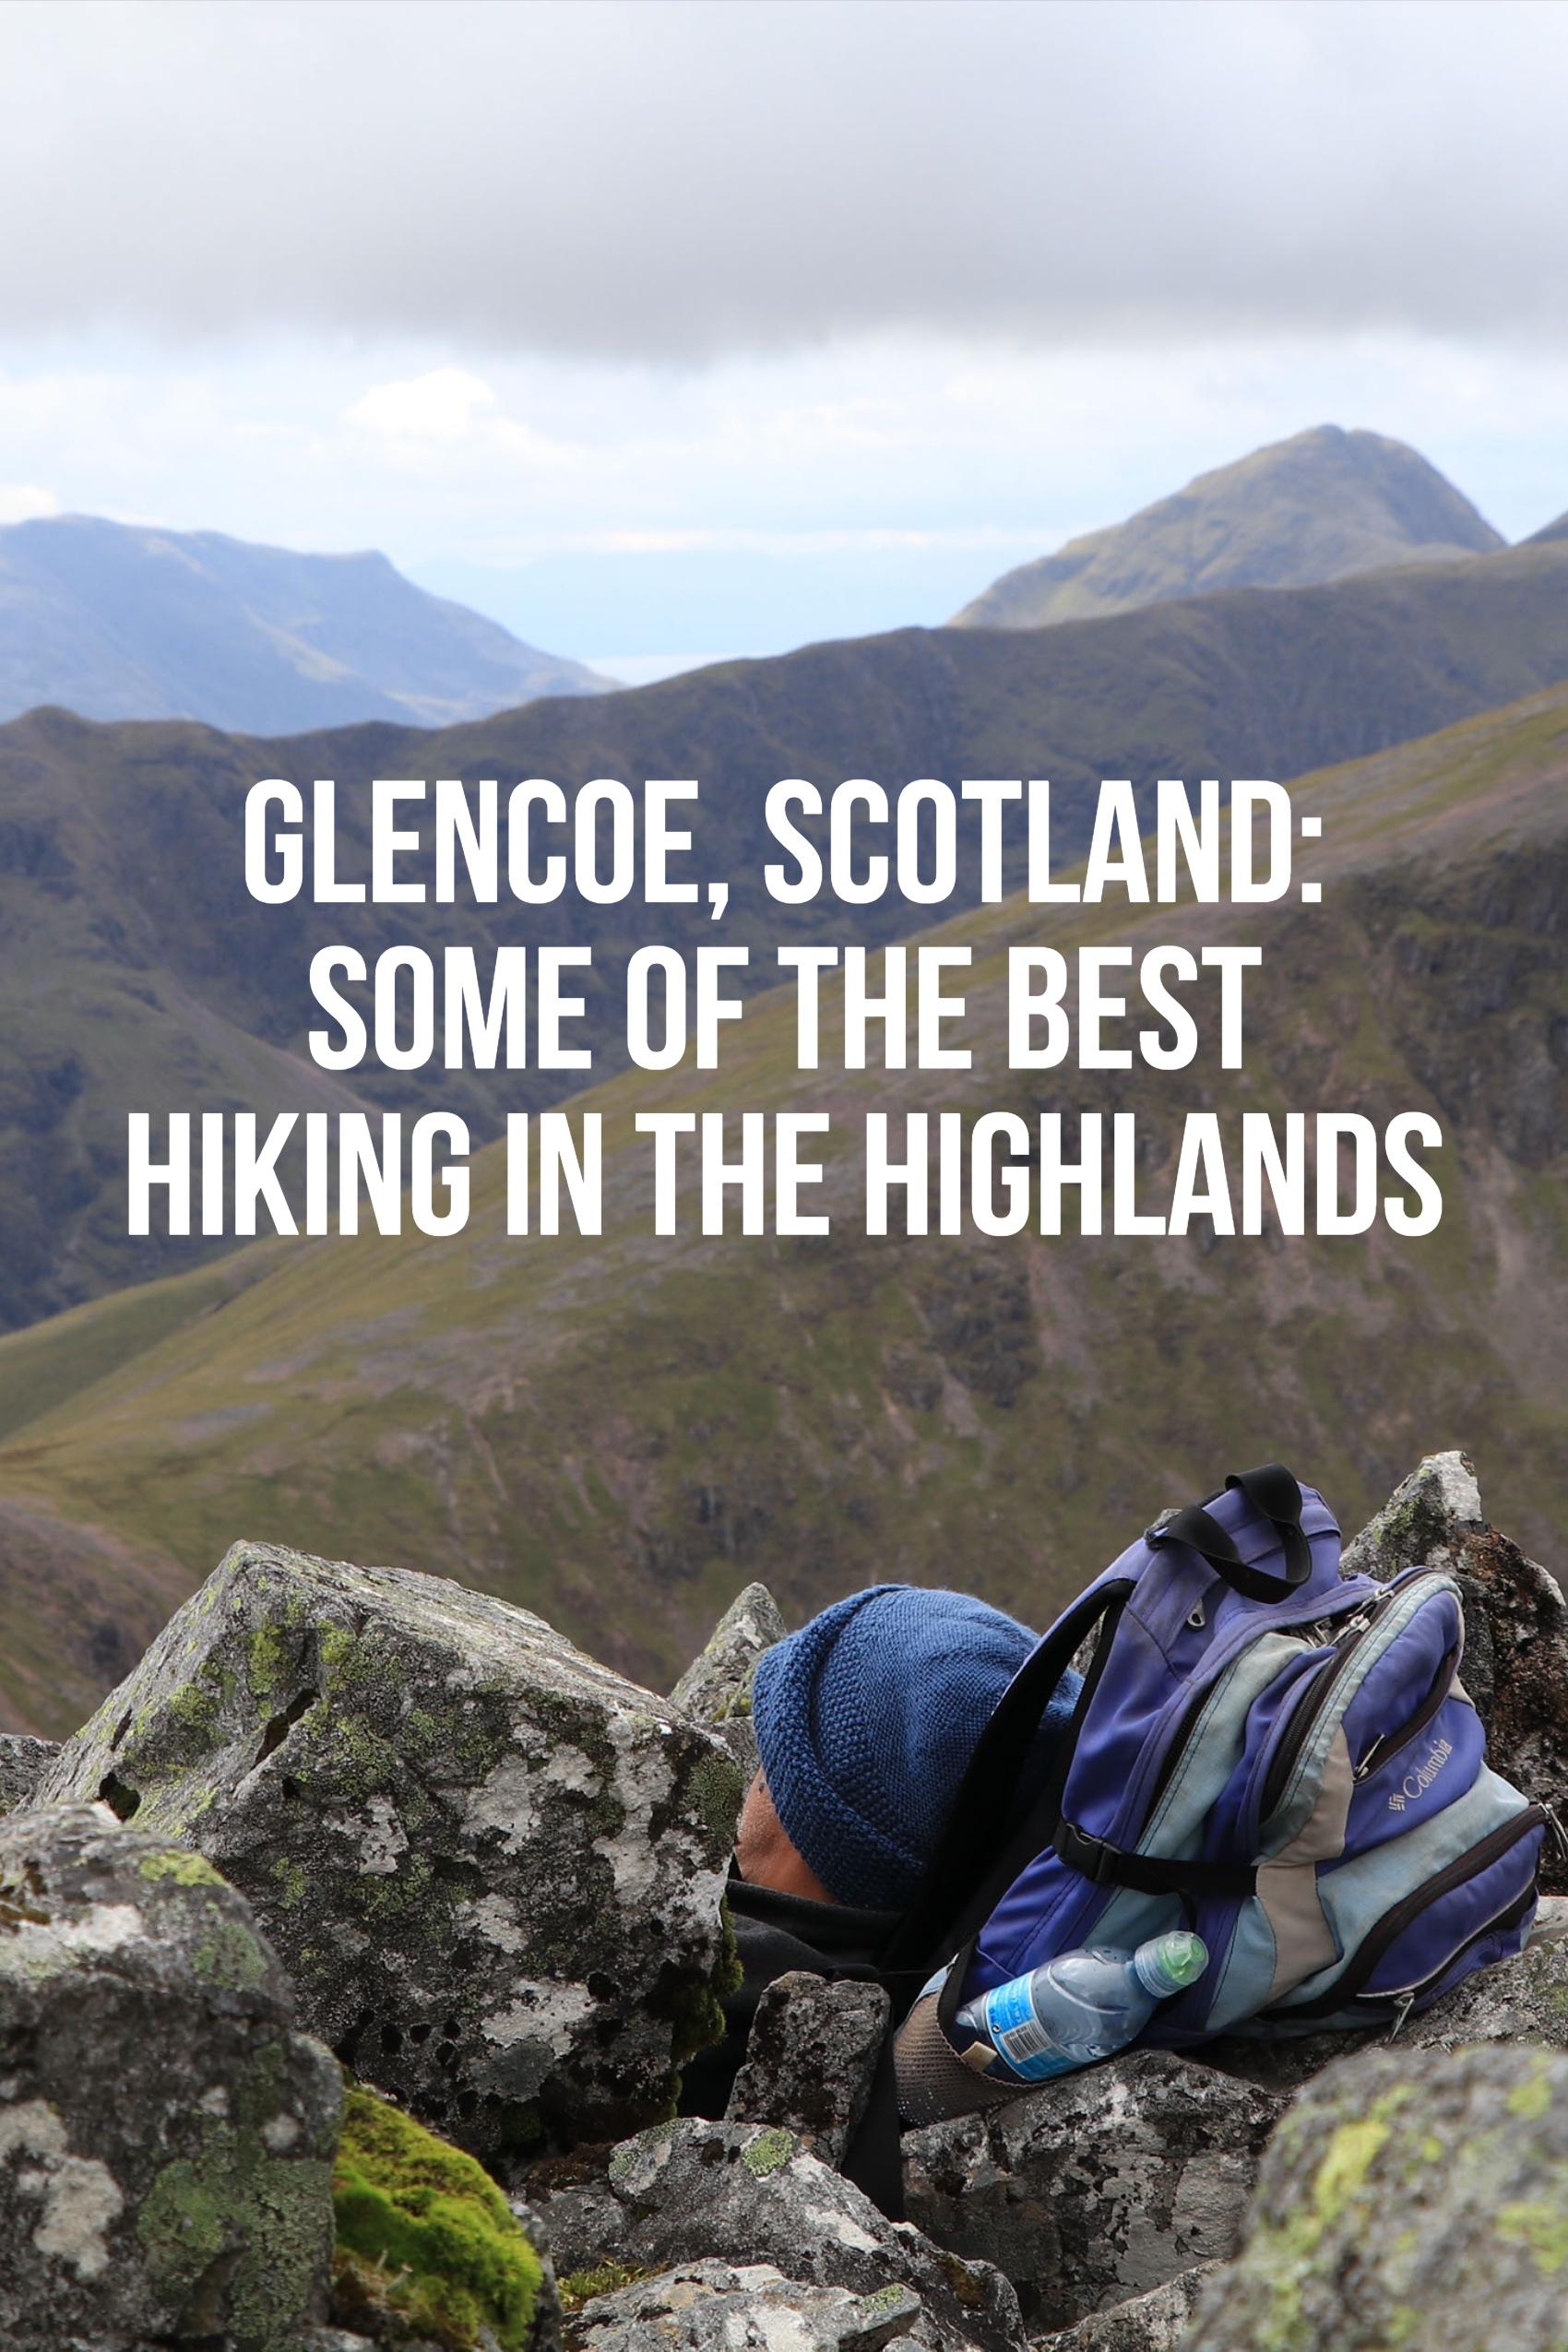 Hiking Buchaille Etive Beag in Glencoe, Scotland